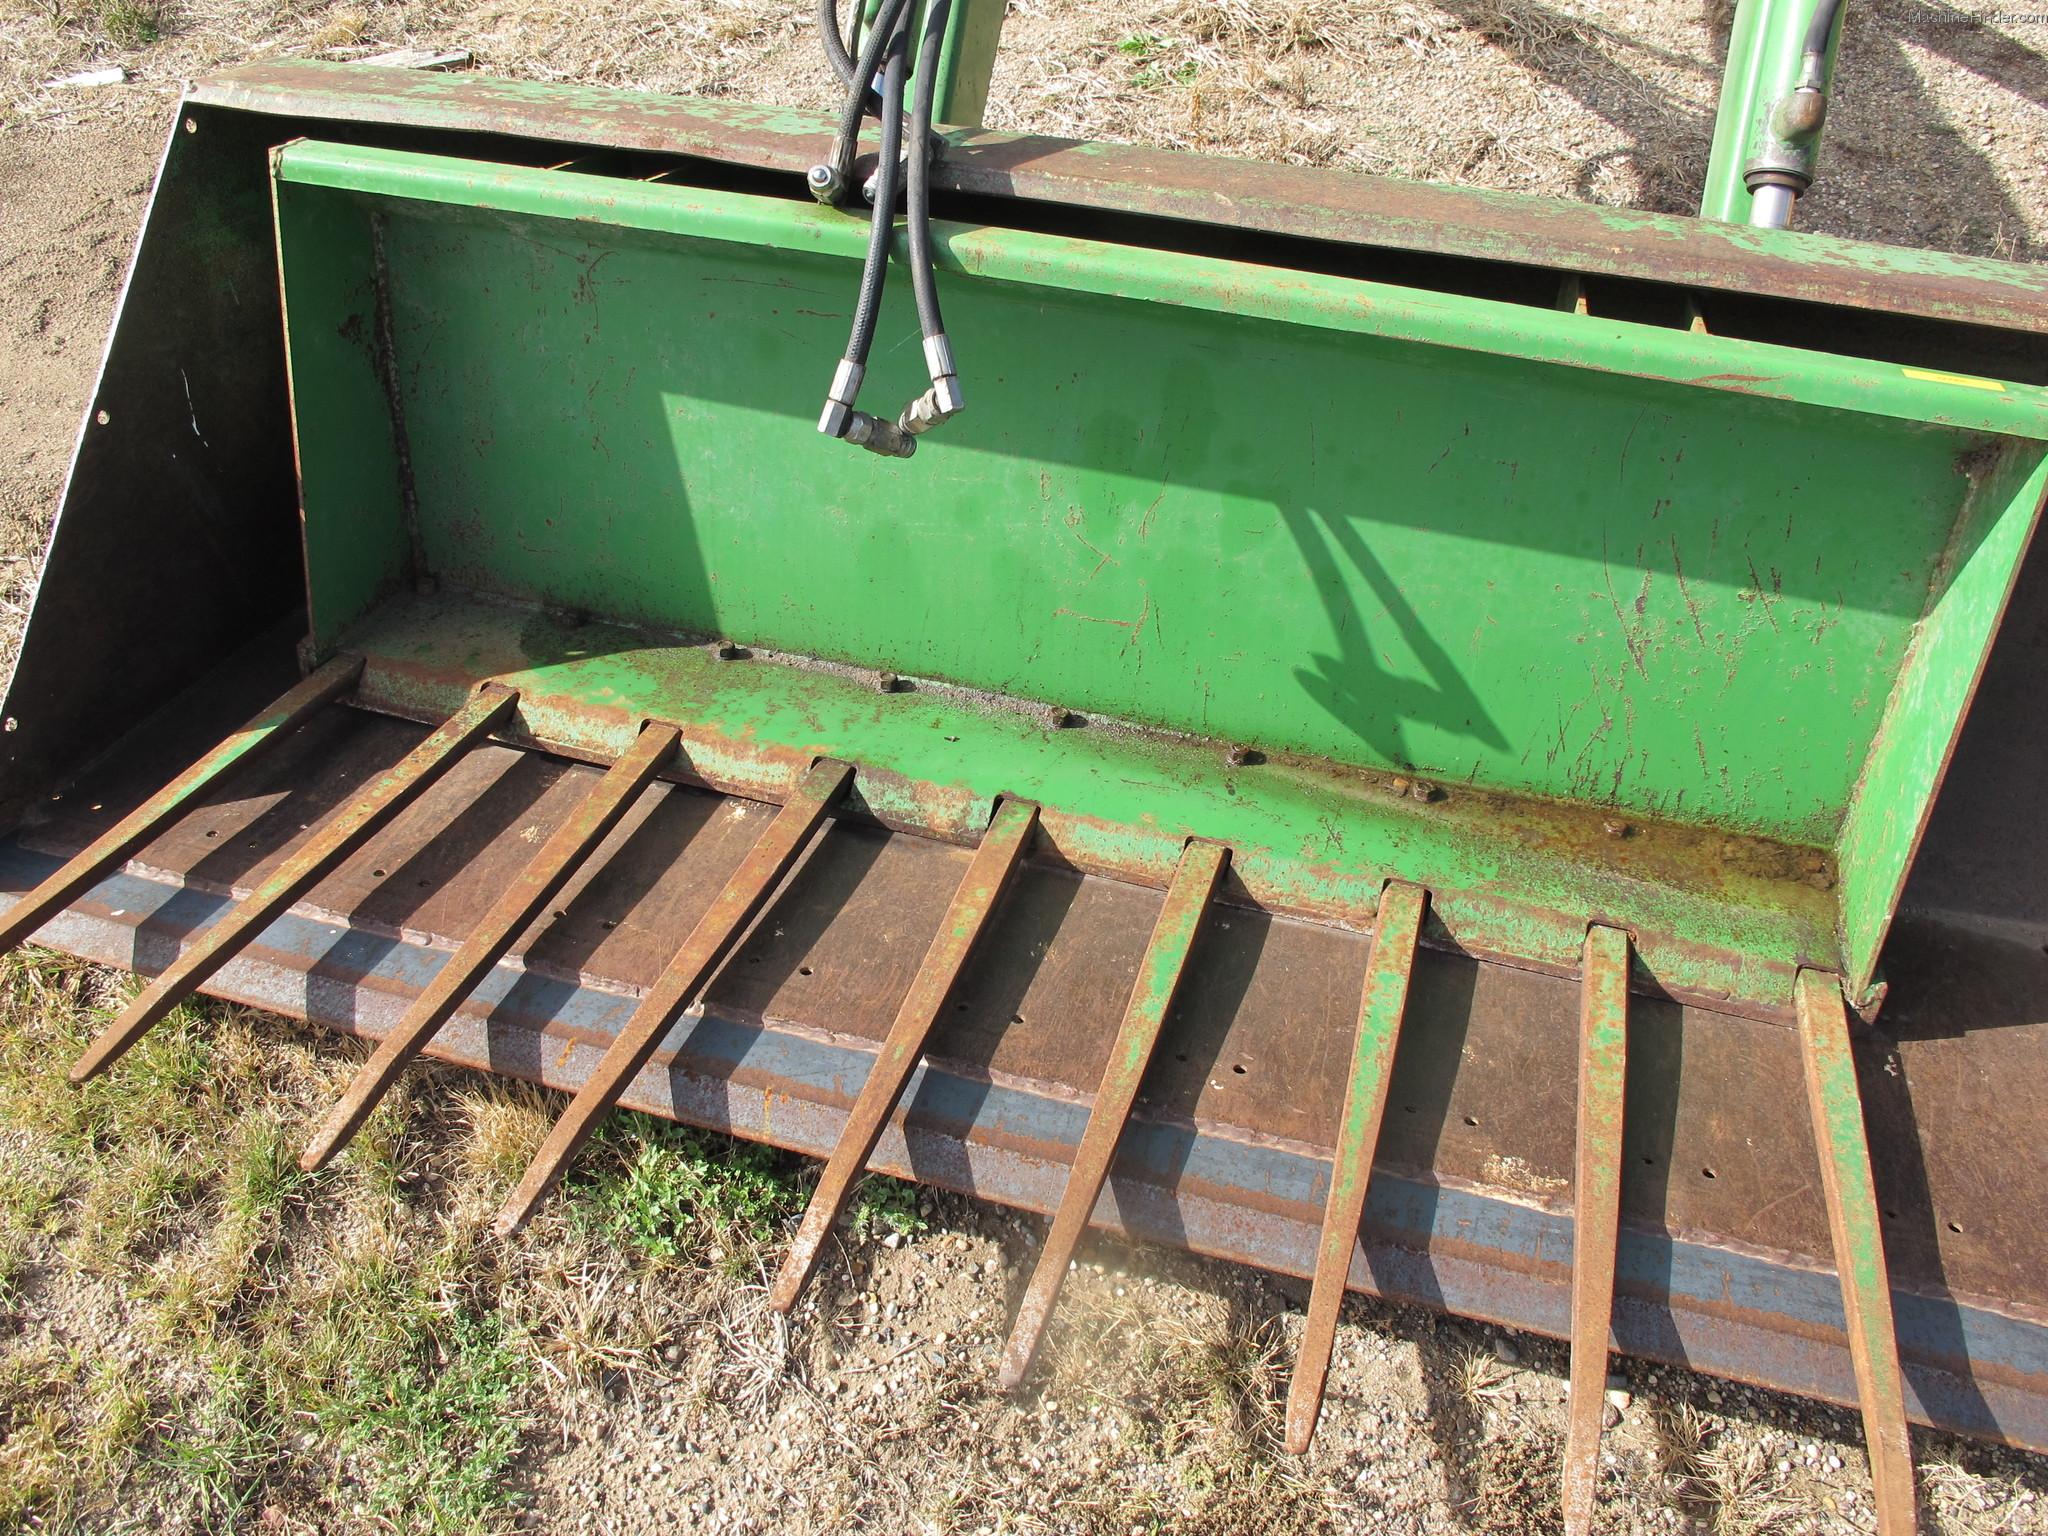 John Deere Manure Bucket Tractor Loaders - John Deere ...